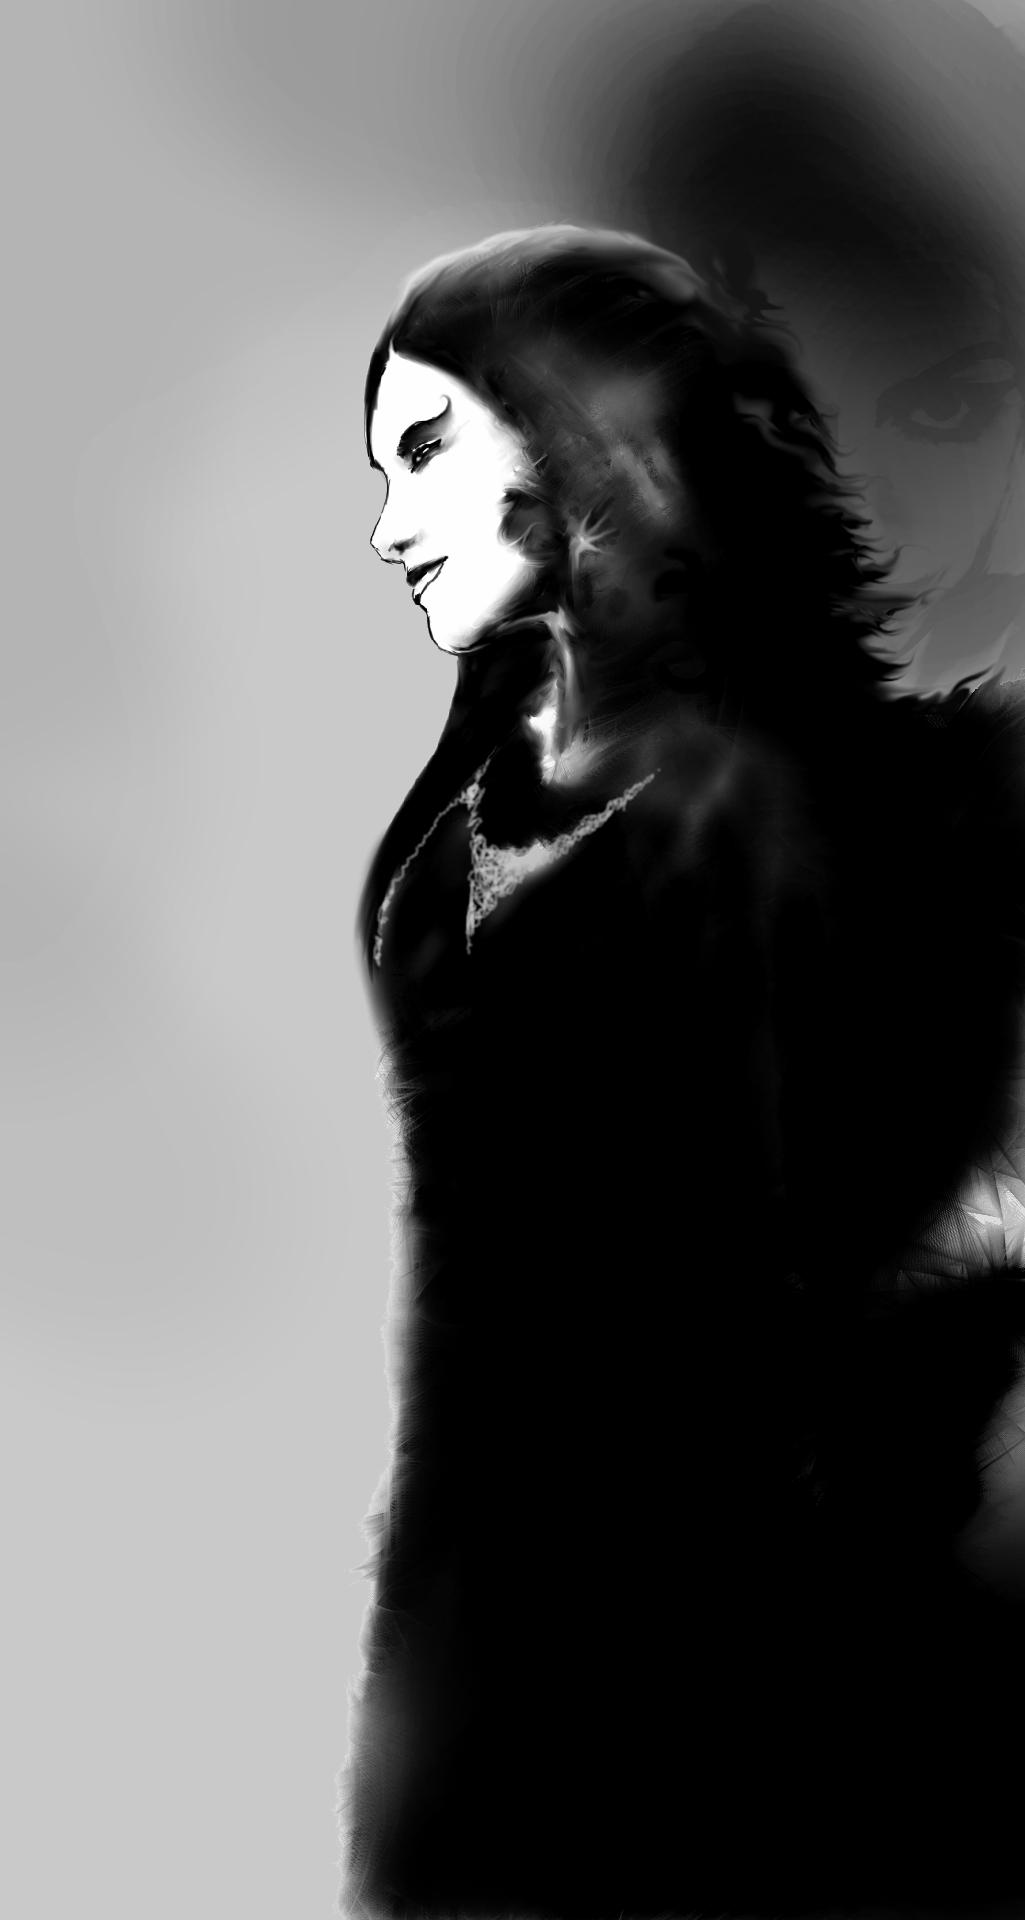 ART_digital_CzarnaOna_02